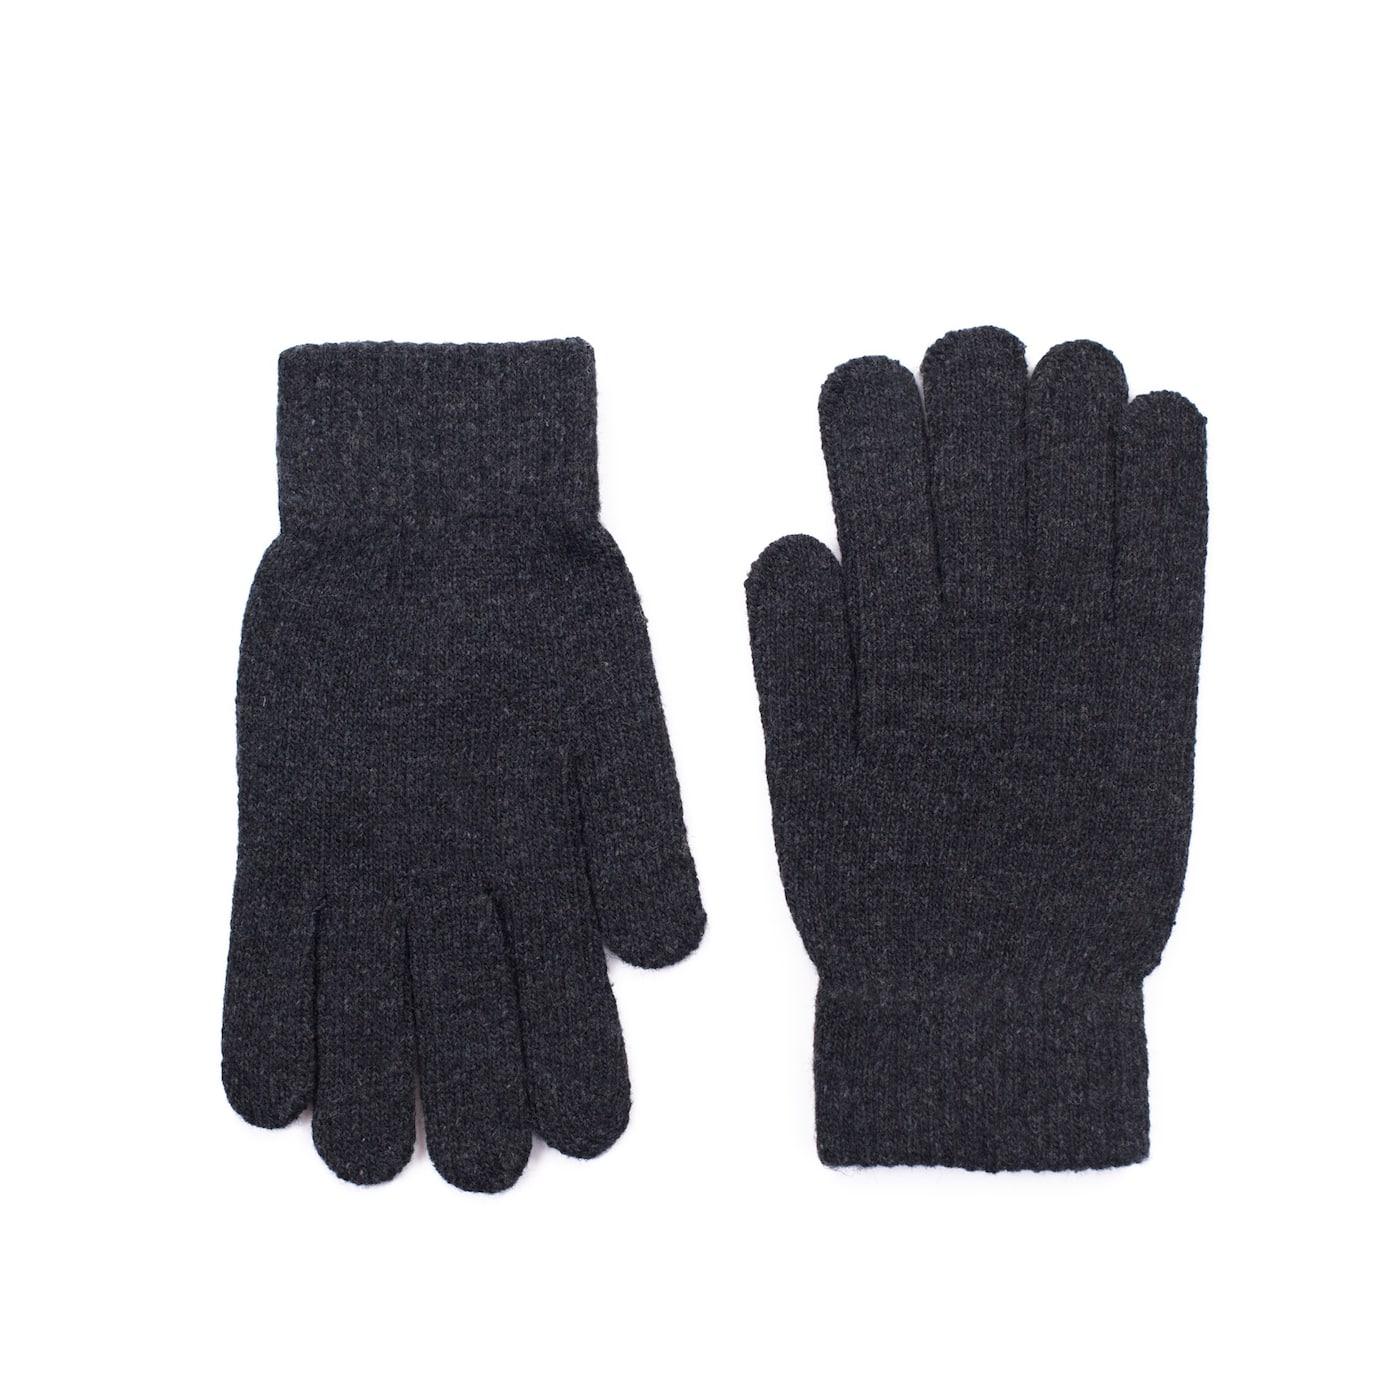 Art Of Polo Man's Gloves rk16423